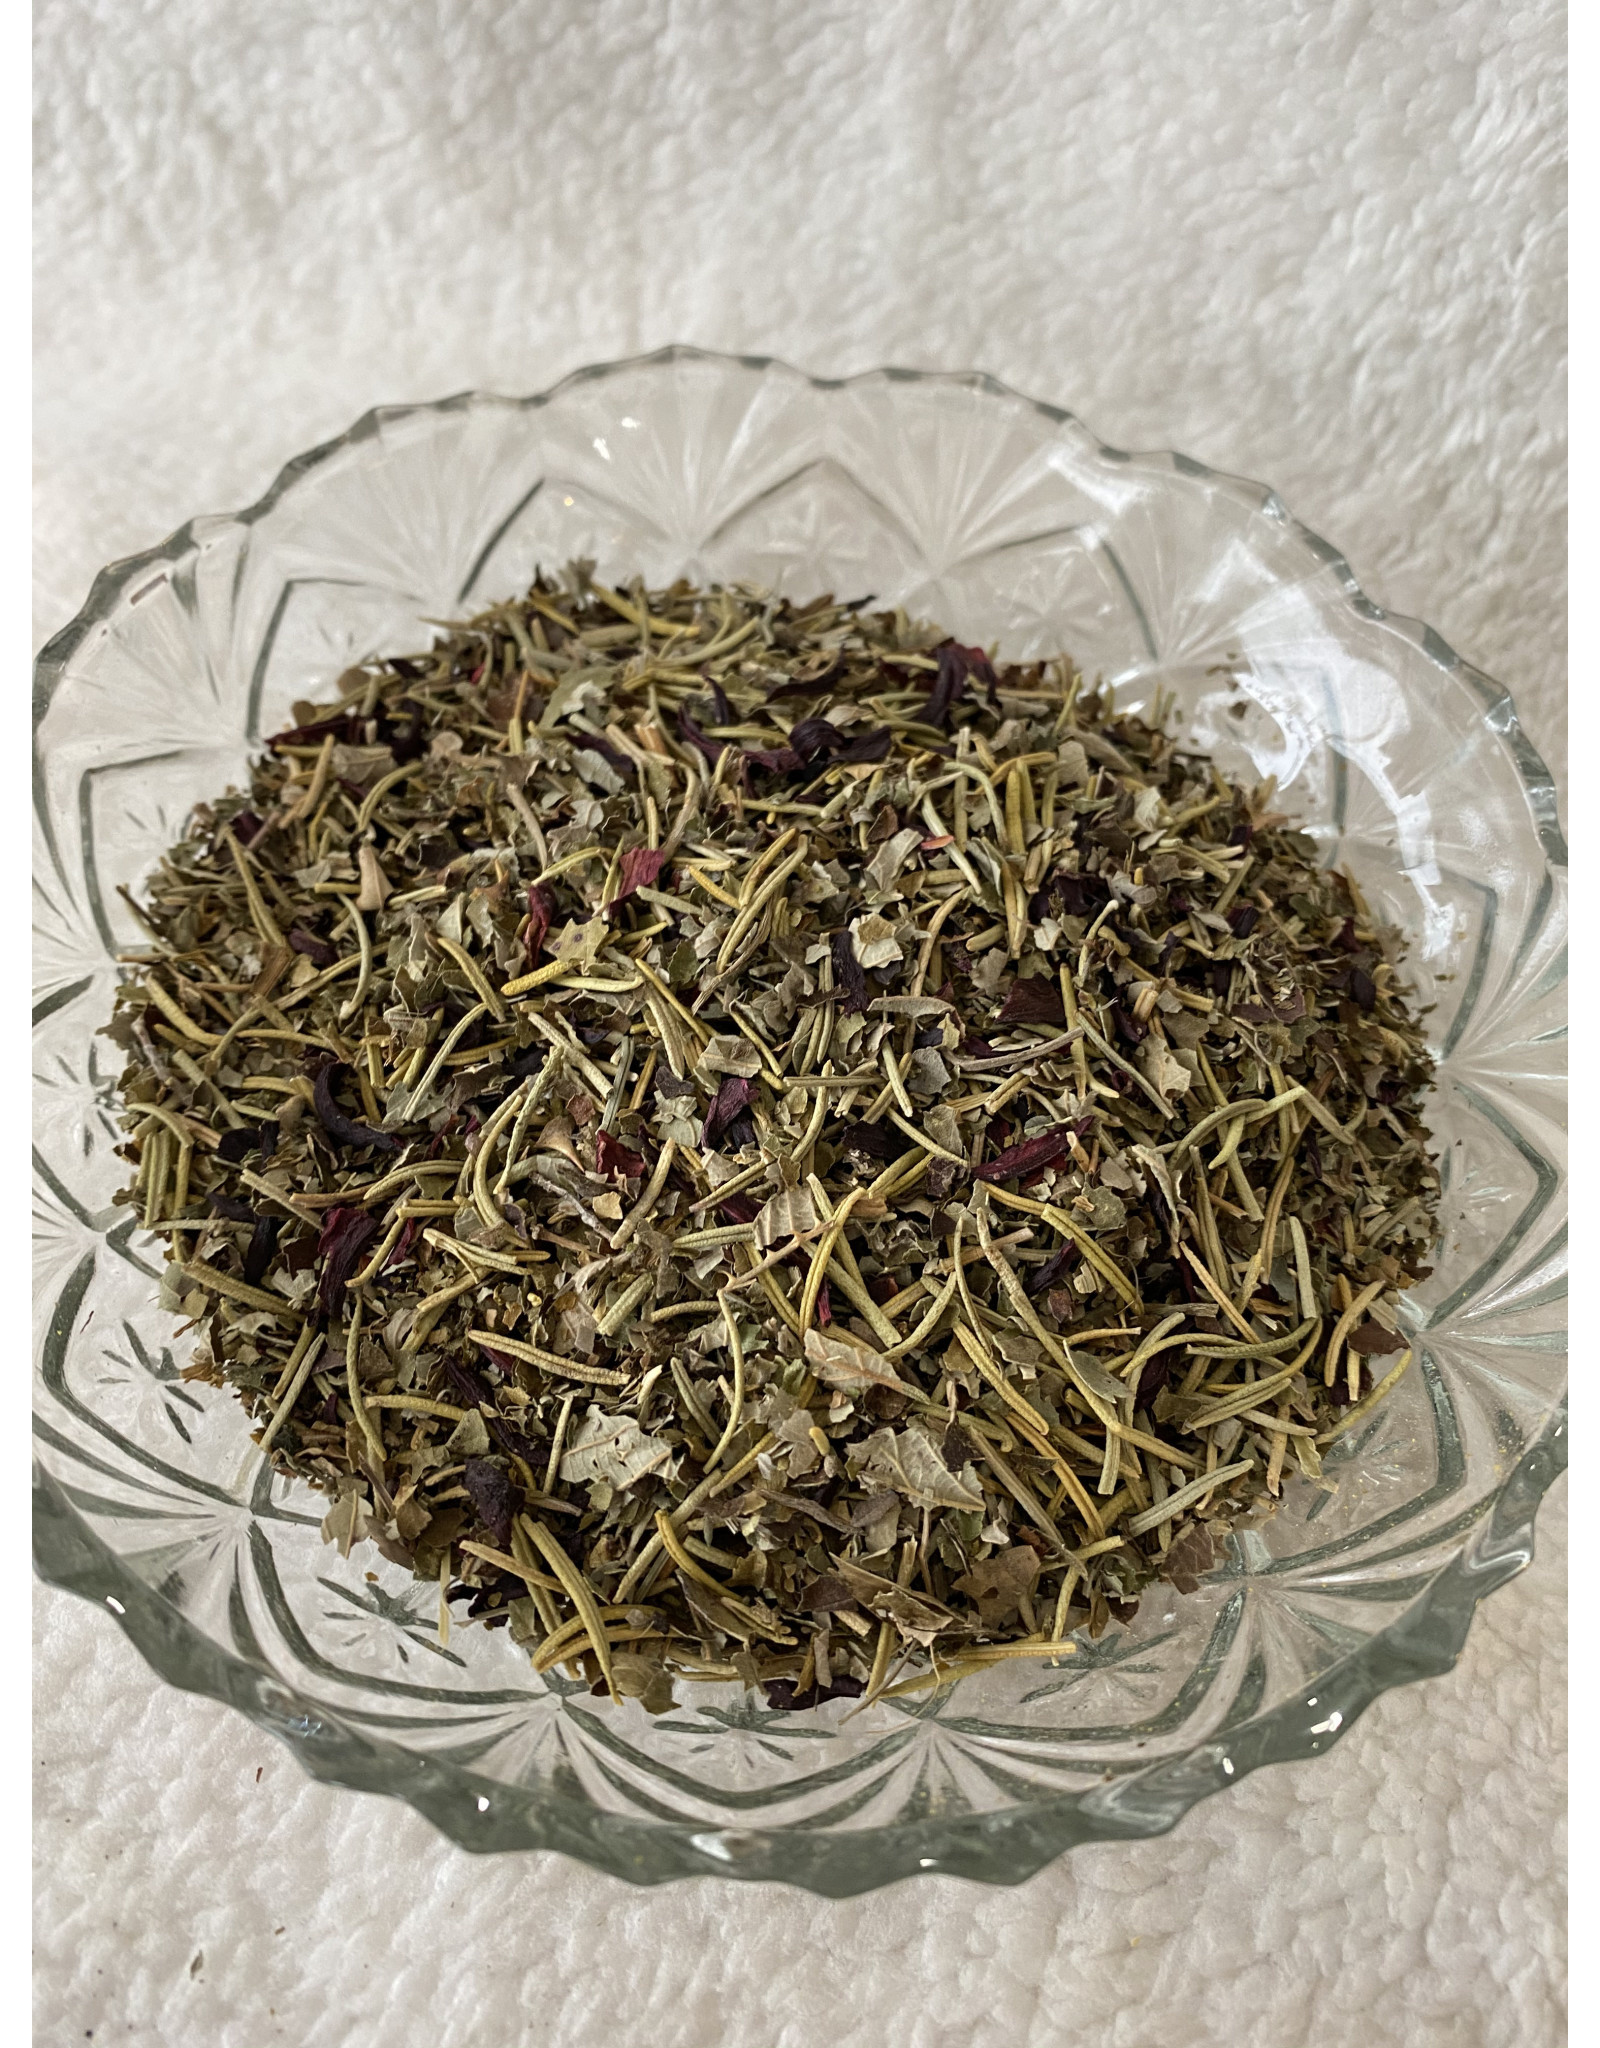 Clarity Tea Blend - 1/2 oz.